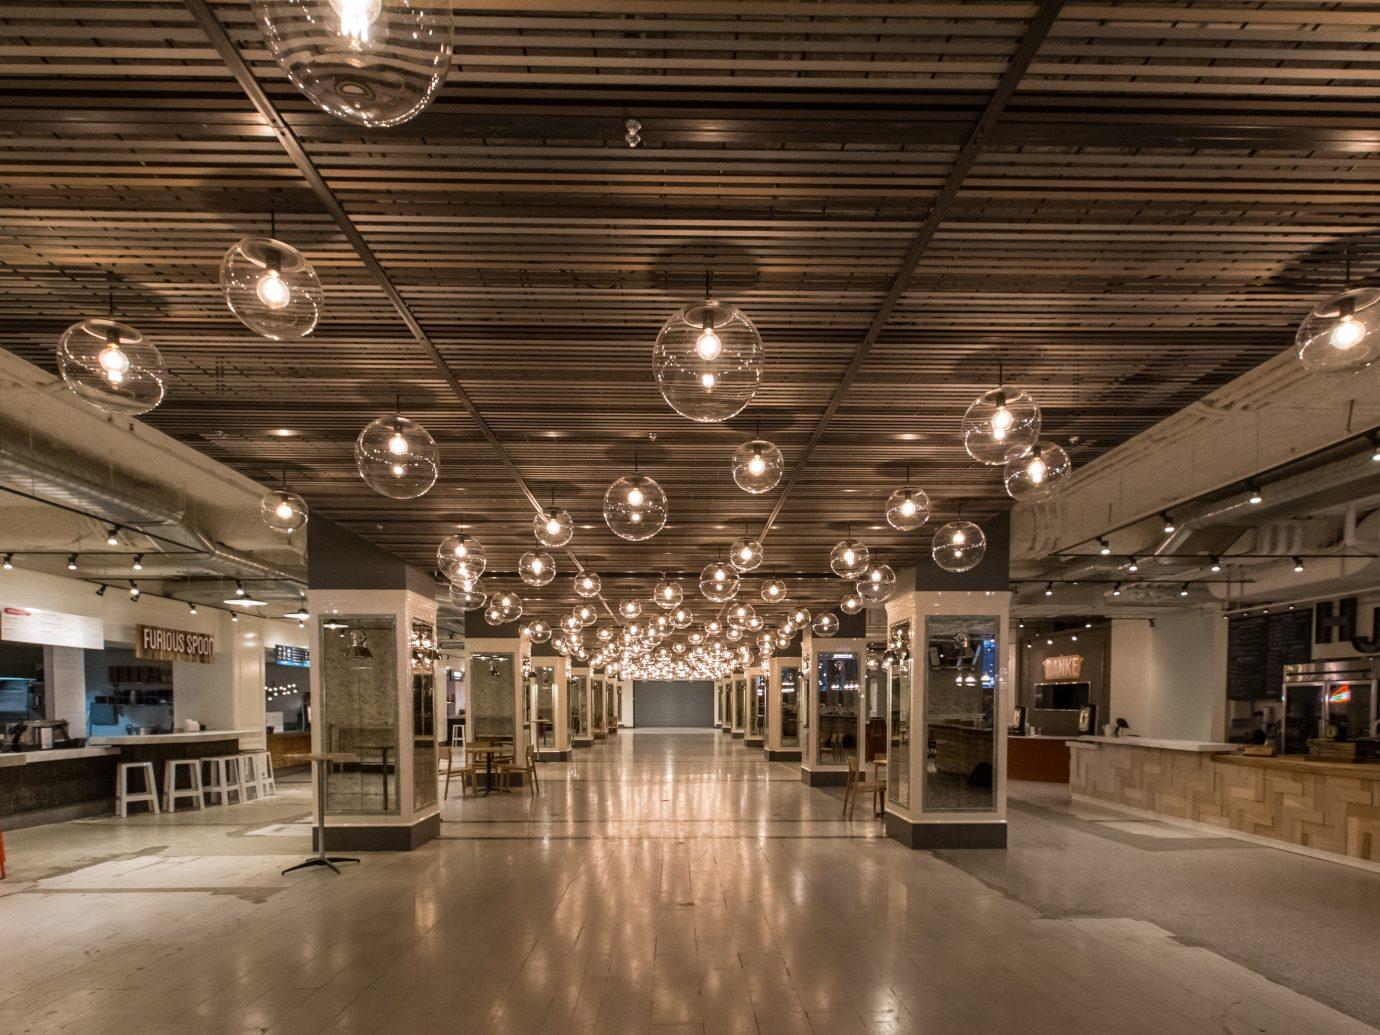 Food + Drink indoor ceiling floor transport building public transport interior design lighting metro station hall several